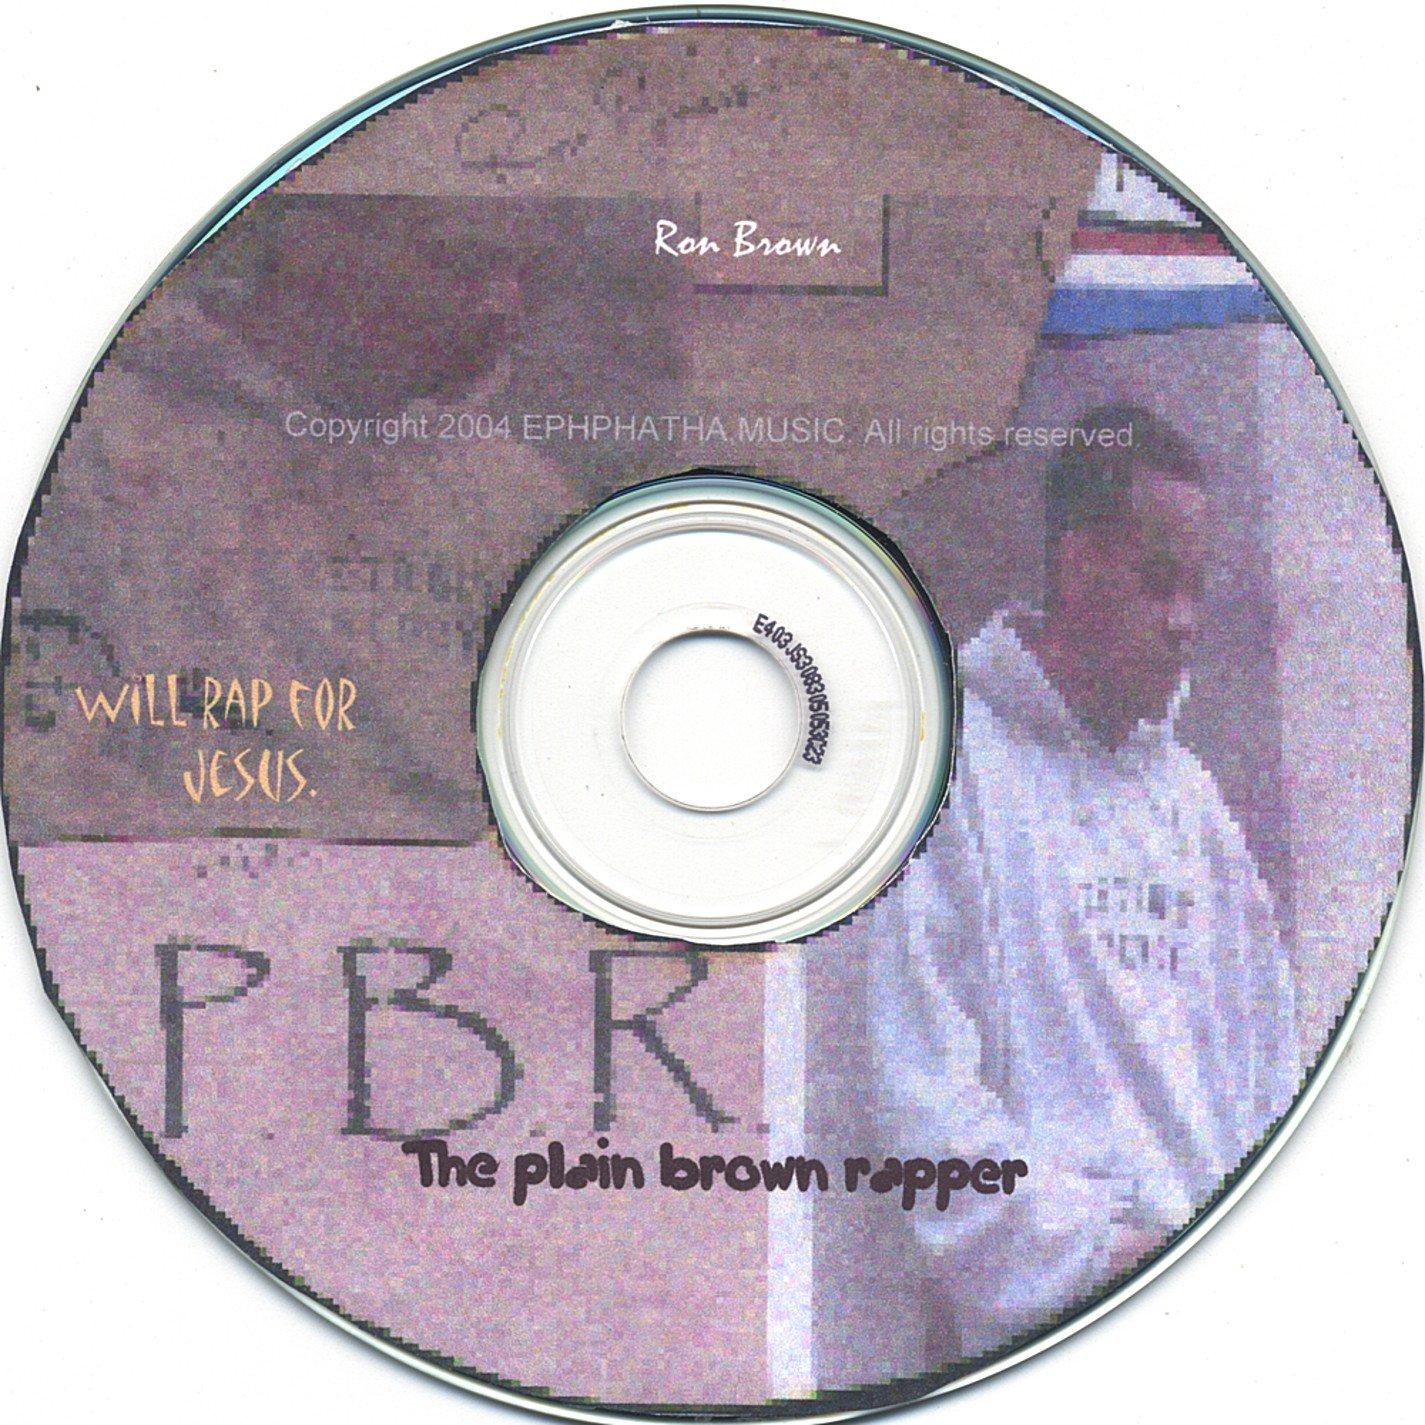 Plain Brown Rapper: Ron Brown: Amazon.es: Música